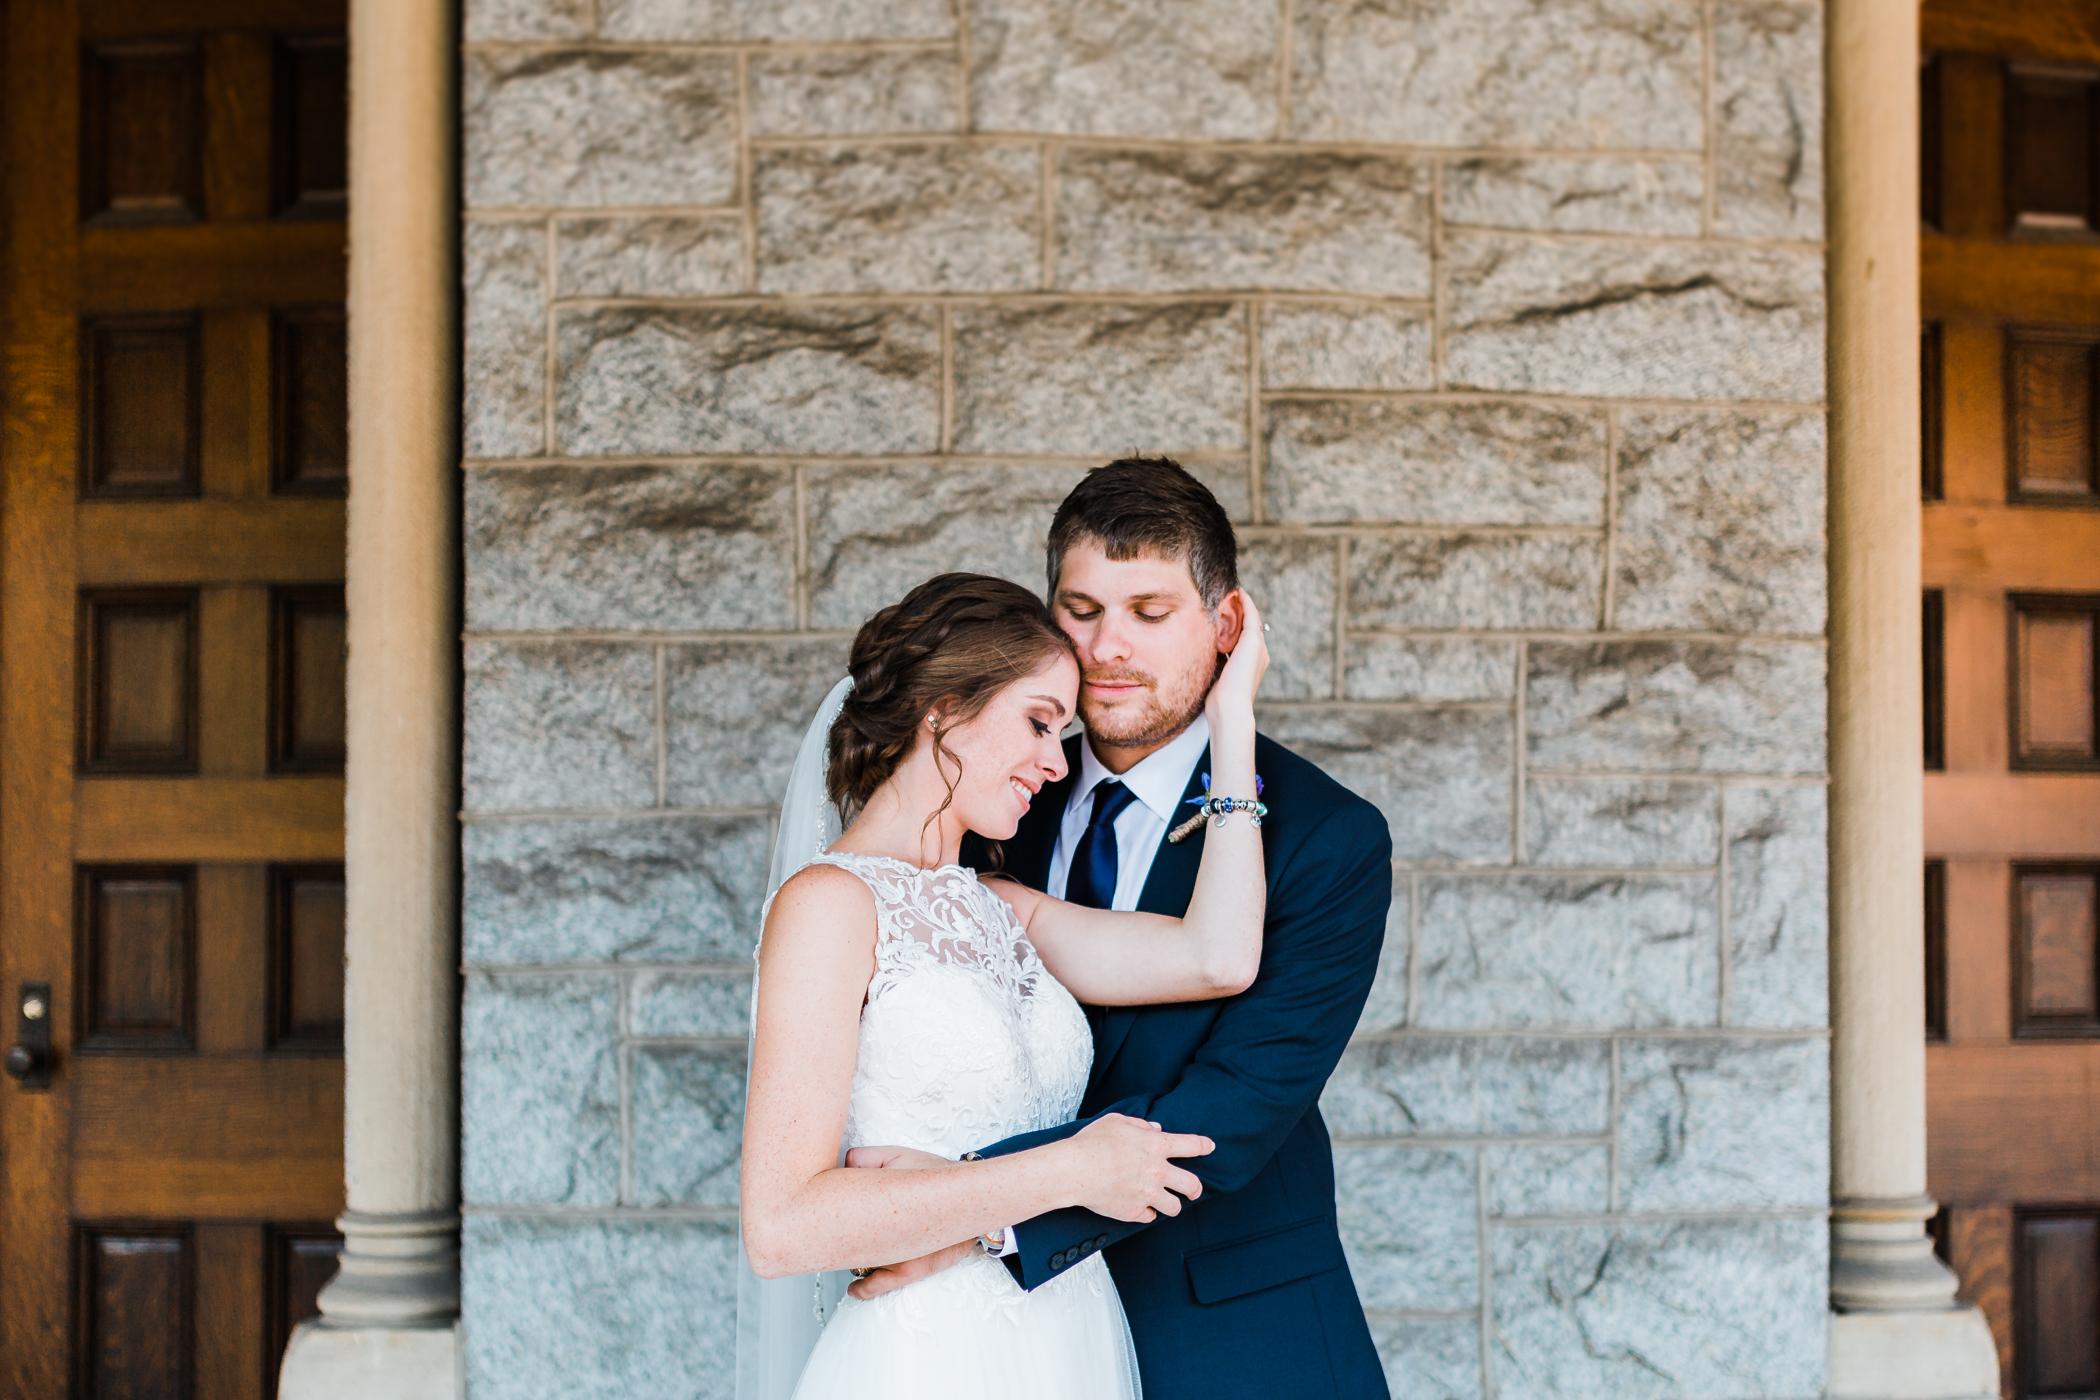 baltimore wedding - couple portraits - md wedding photographer - dc maryland and virginia